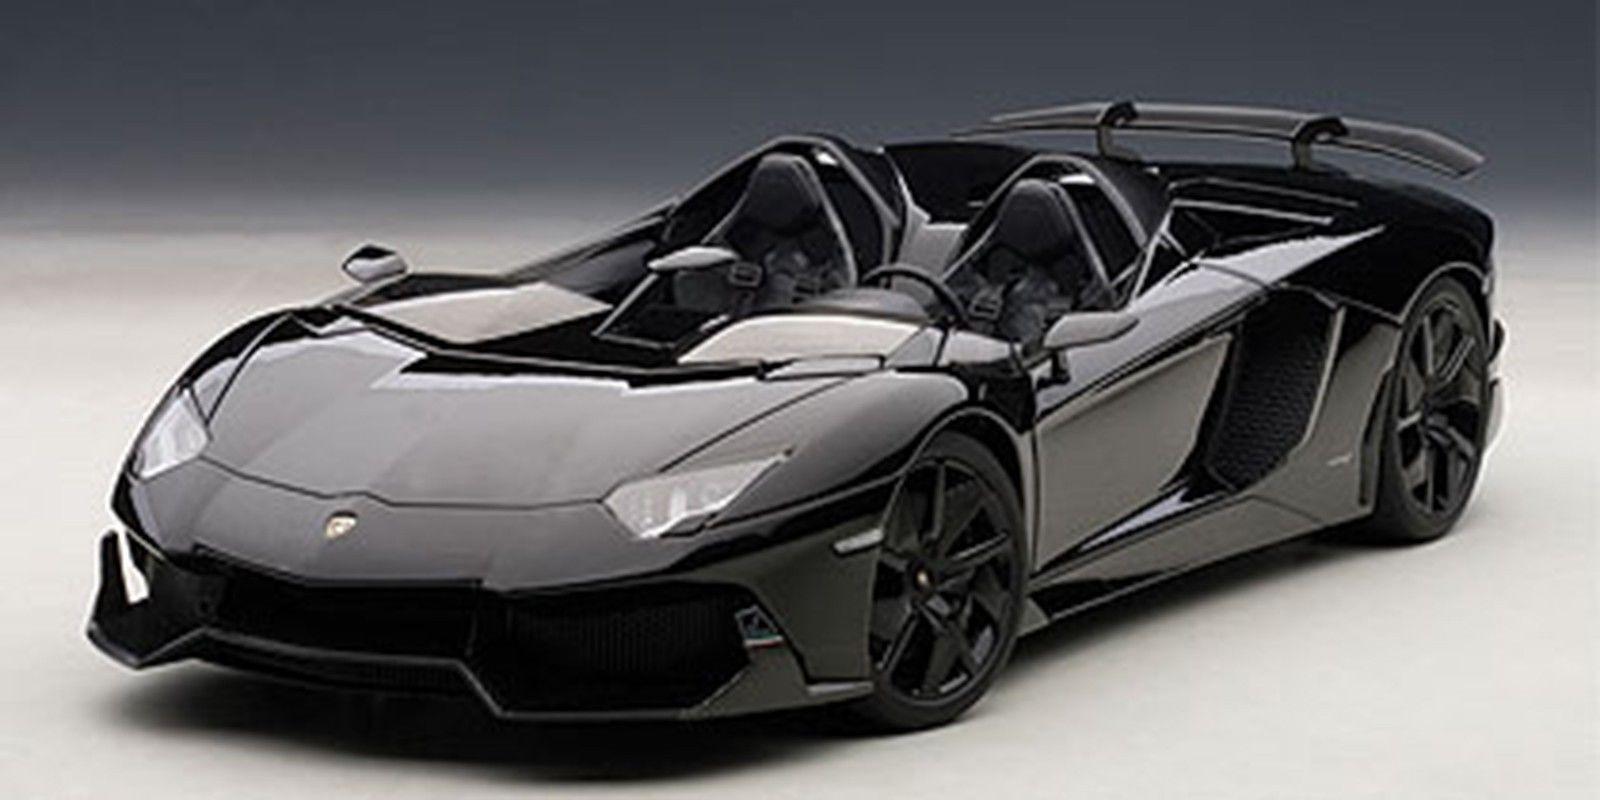 Autoart Lamborghini Aventador J Negro 1:18  Super BONITA